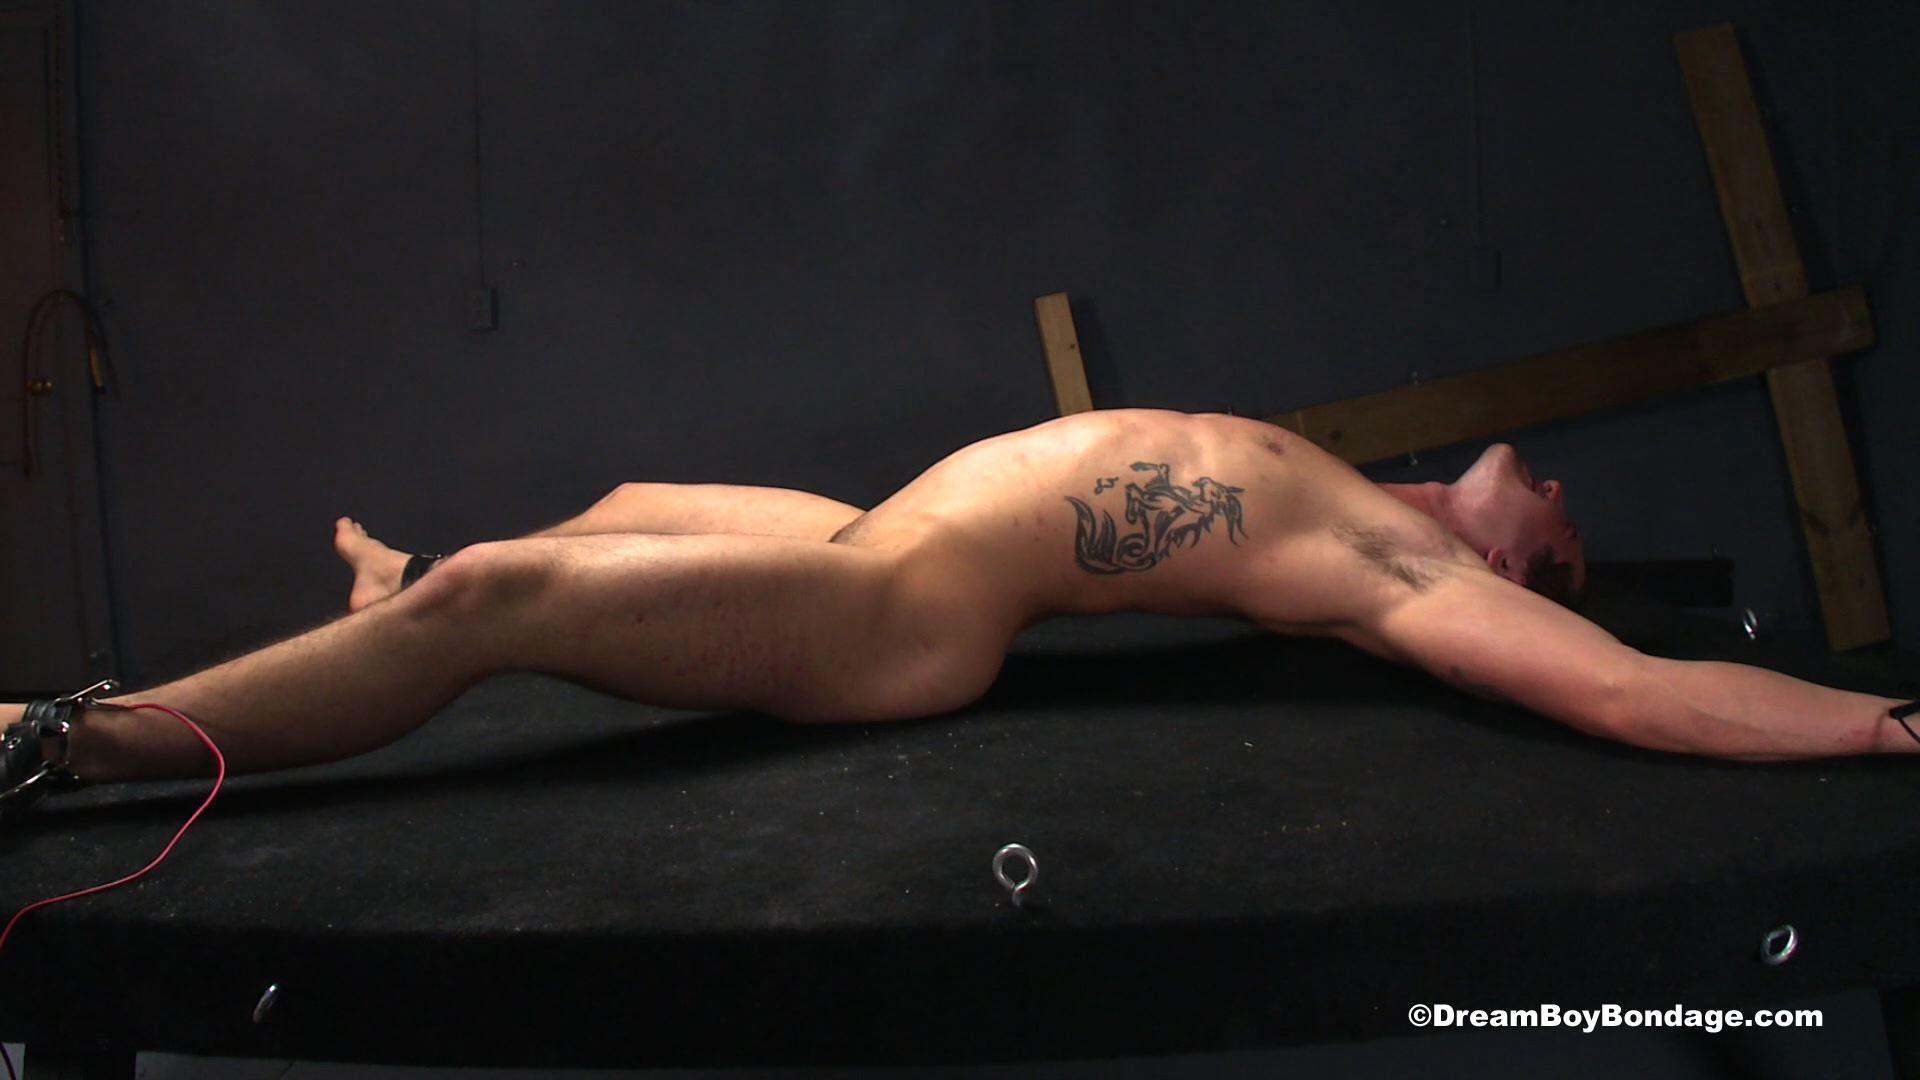 Free dream boy bondage